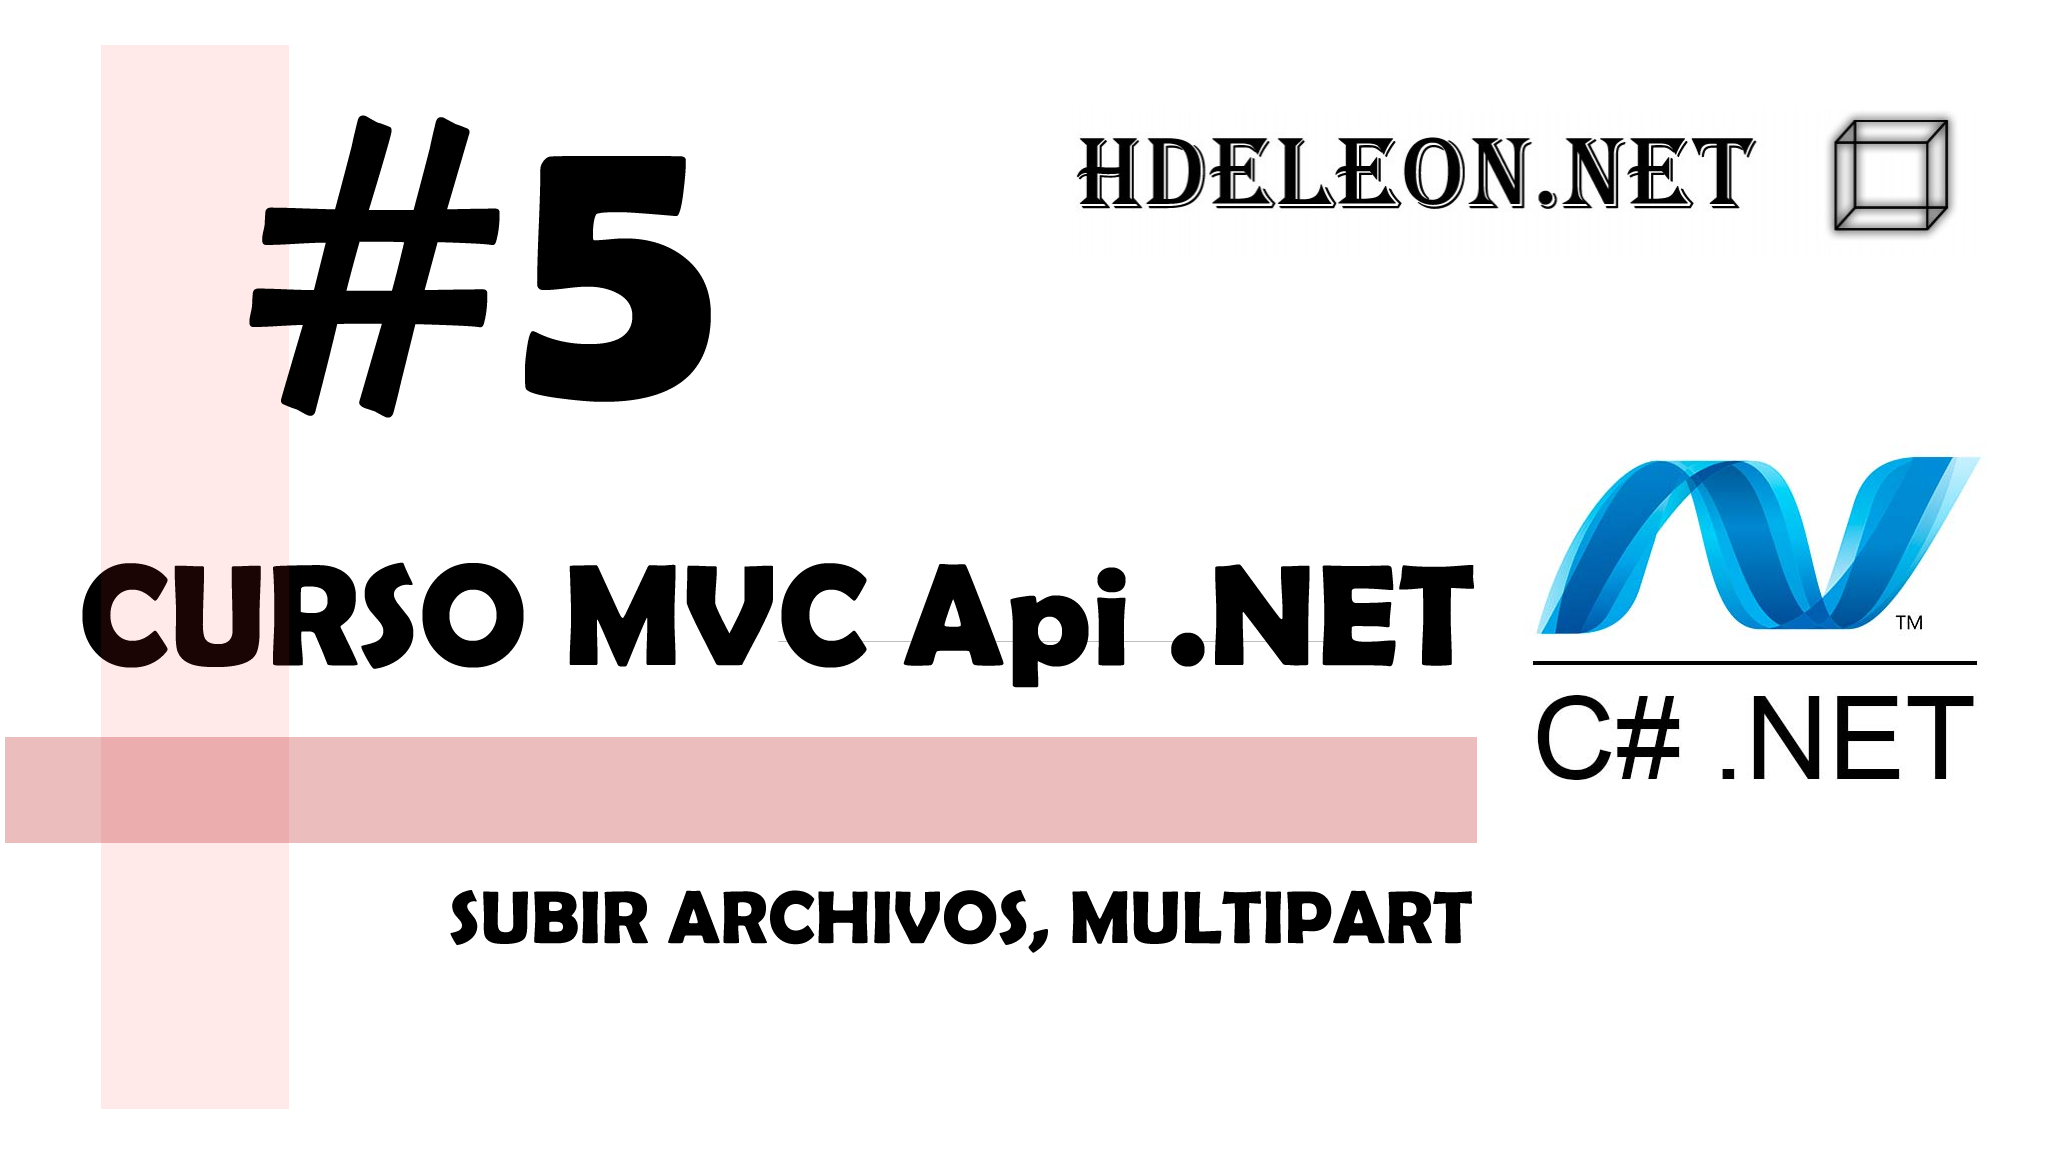 Curso de MVC API .Net C#, Subir archivos, Multipart, #5